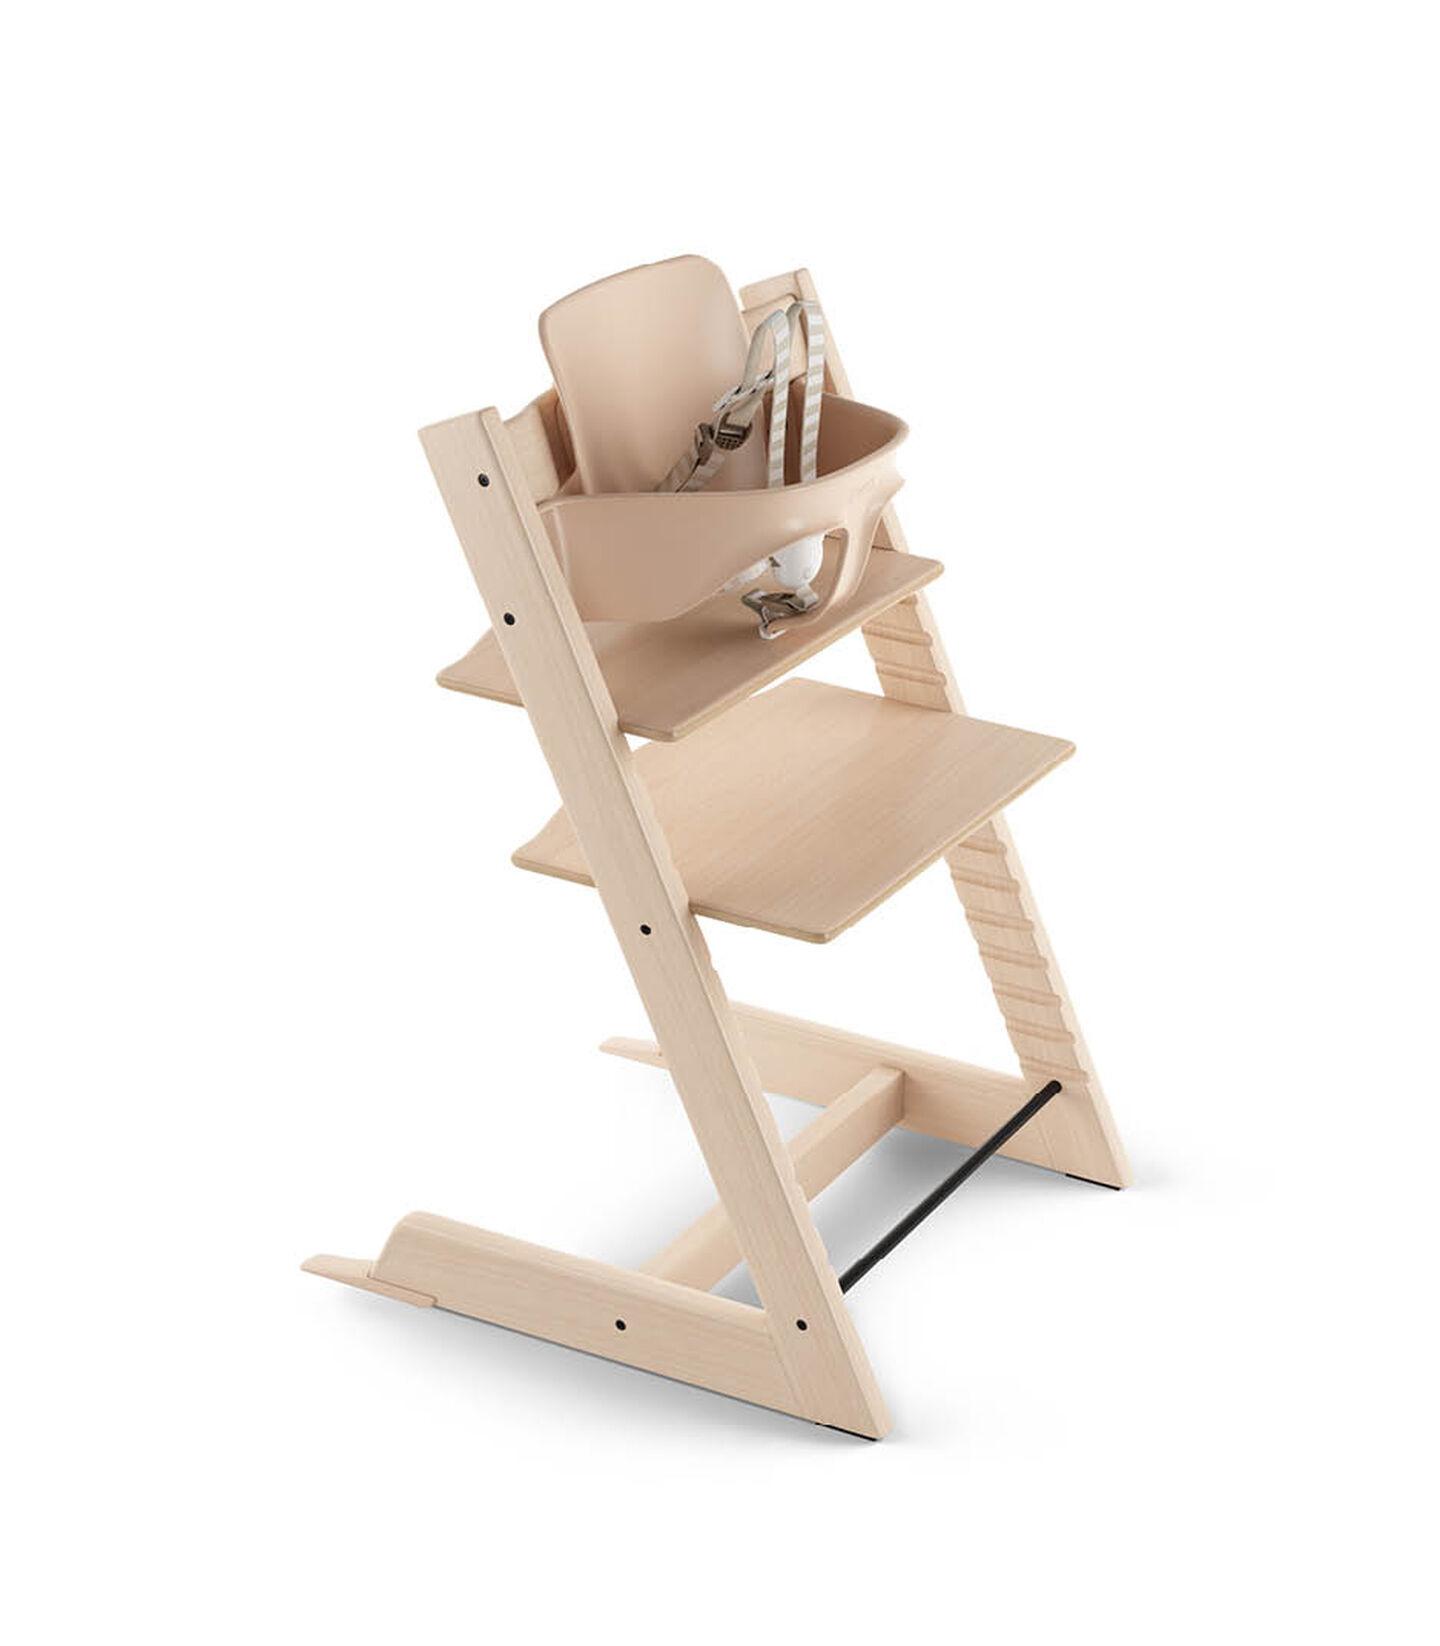 Tripp Trapp® Bundle High Chair US 18 Natural, Natural, mainview view 2